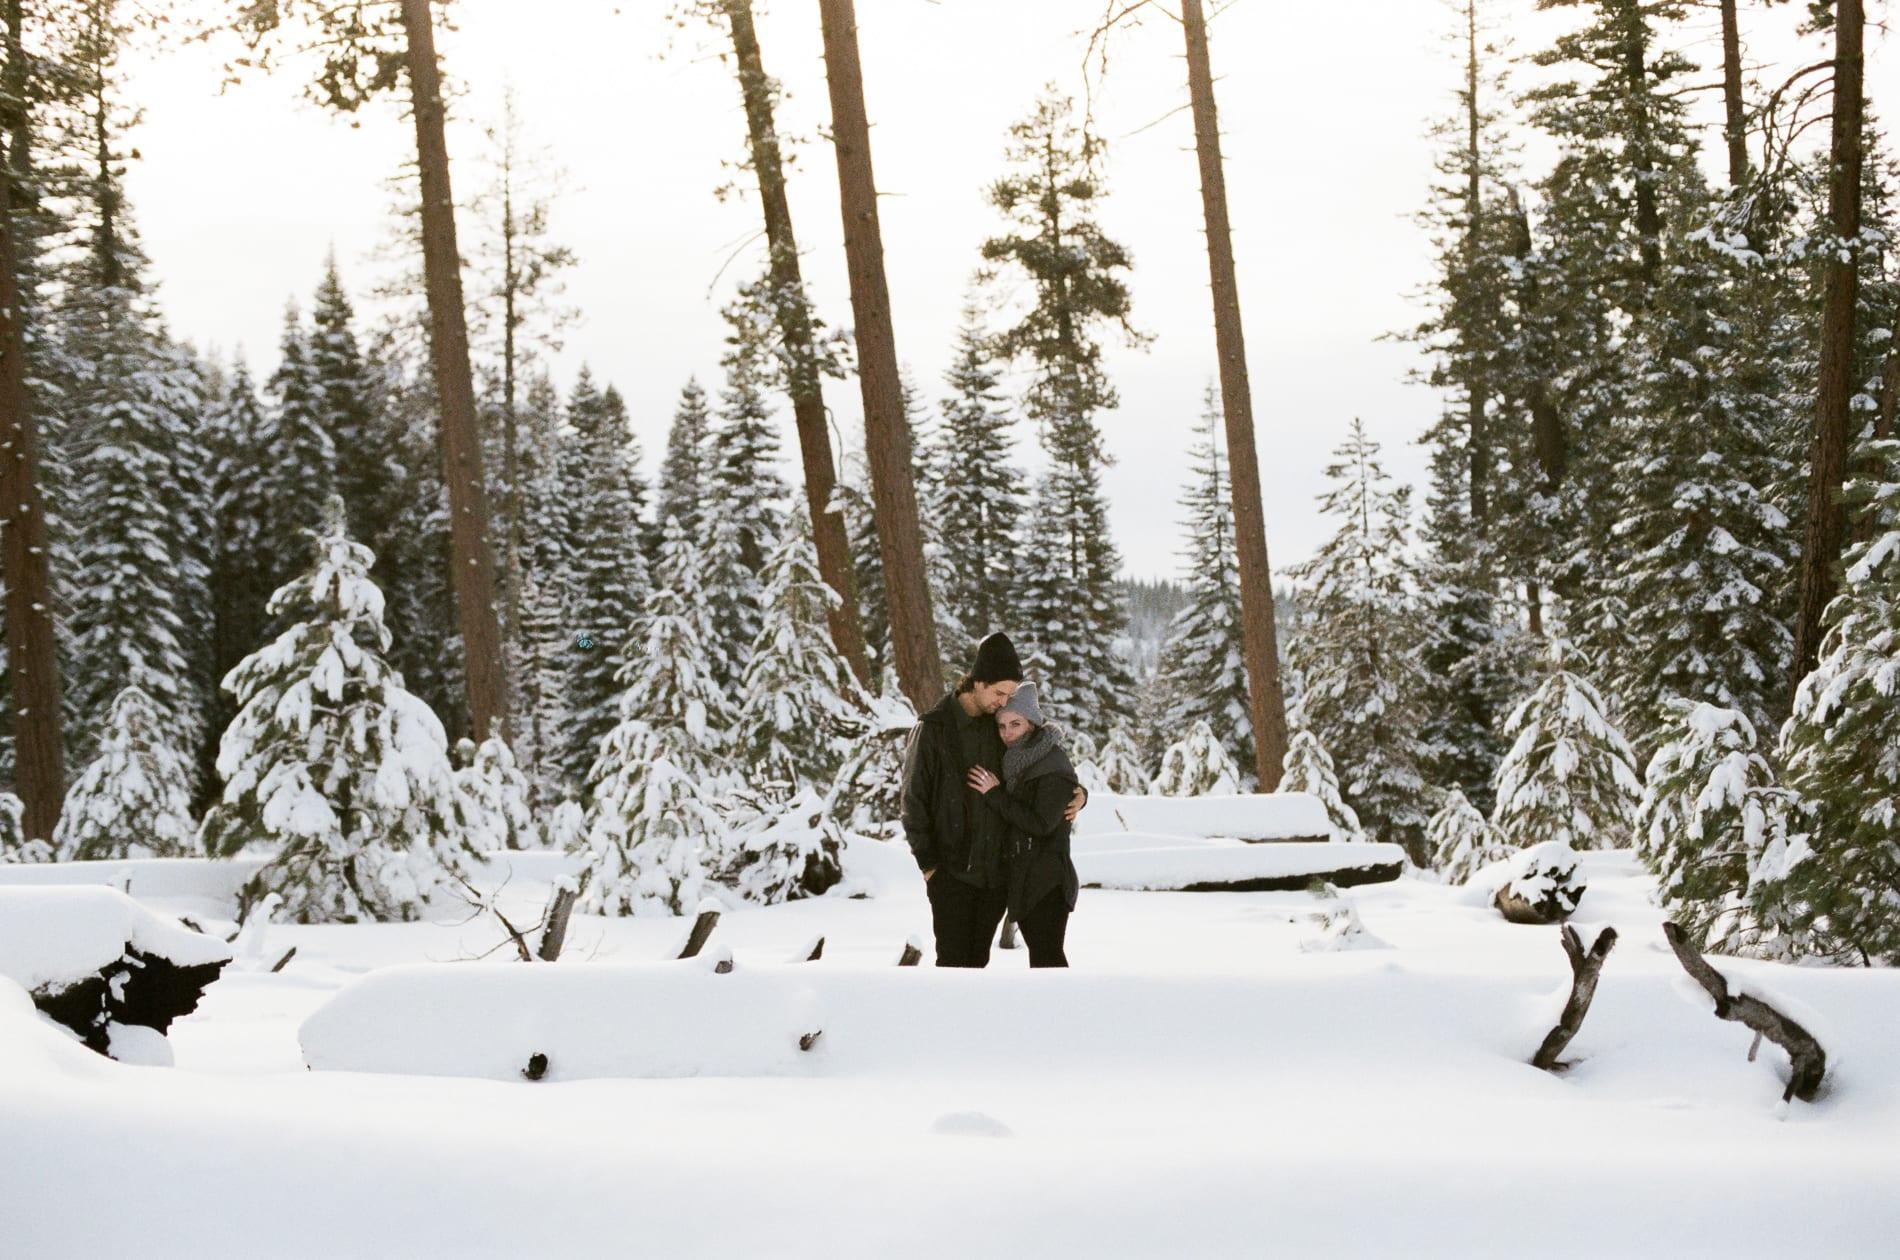 mt-lassen-winter-snow-couples-photo-8